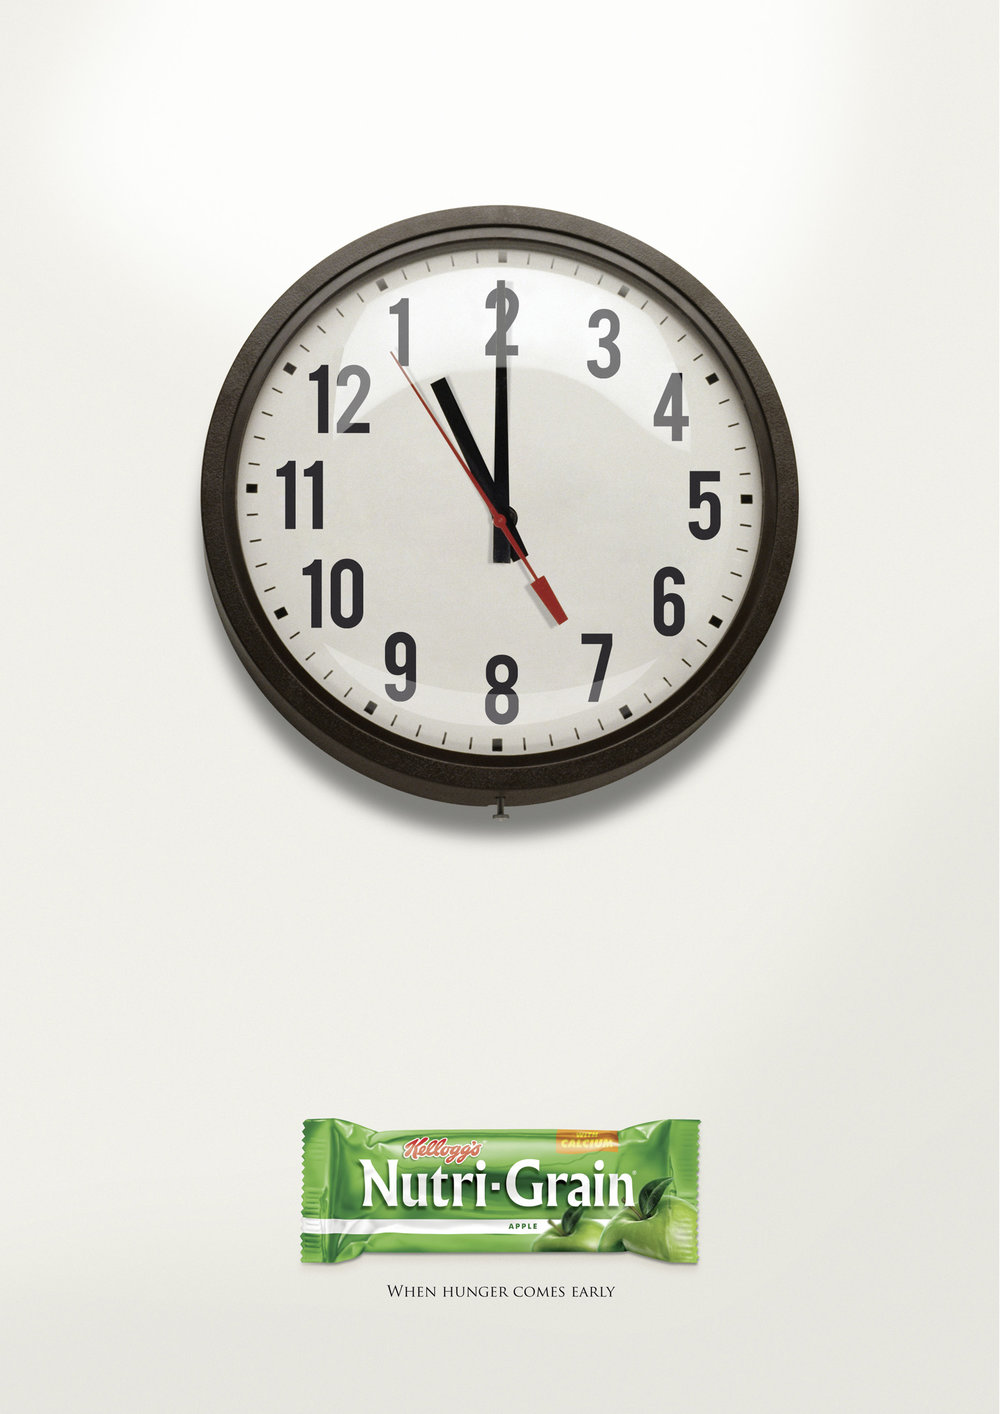 Nutri_grain.jpg